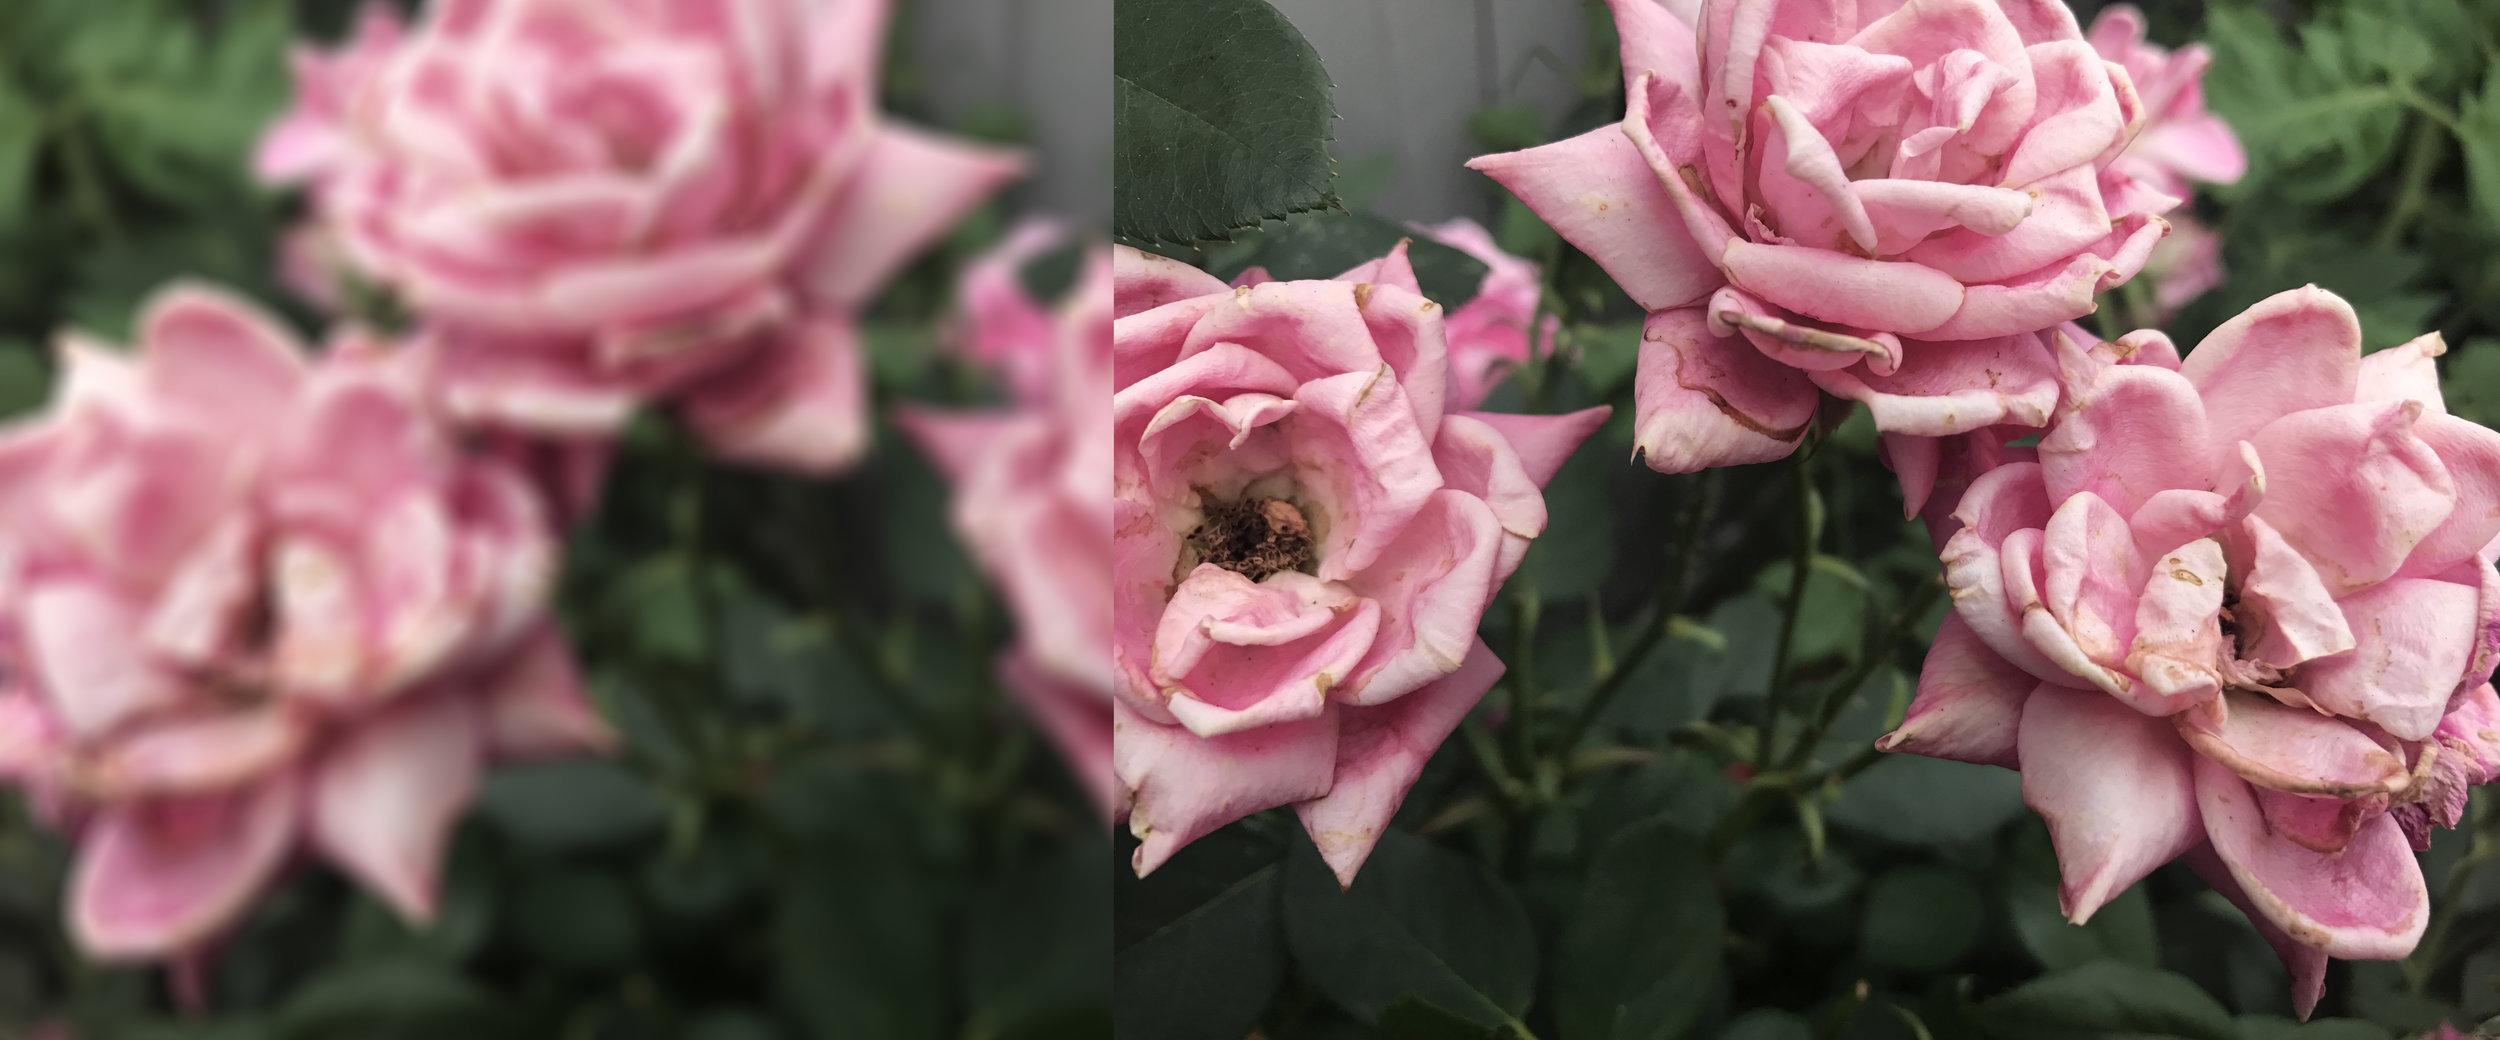 Three blured clear roses diptique 2.jpg